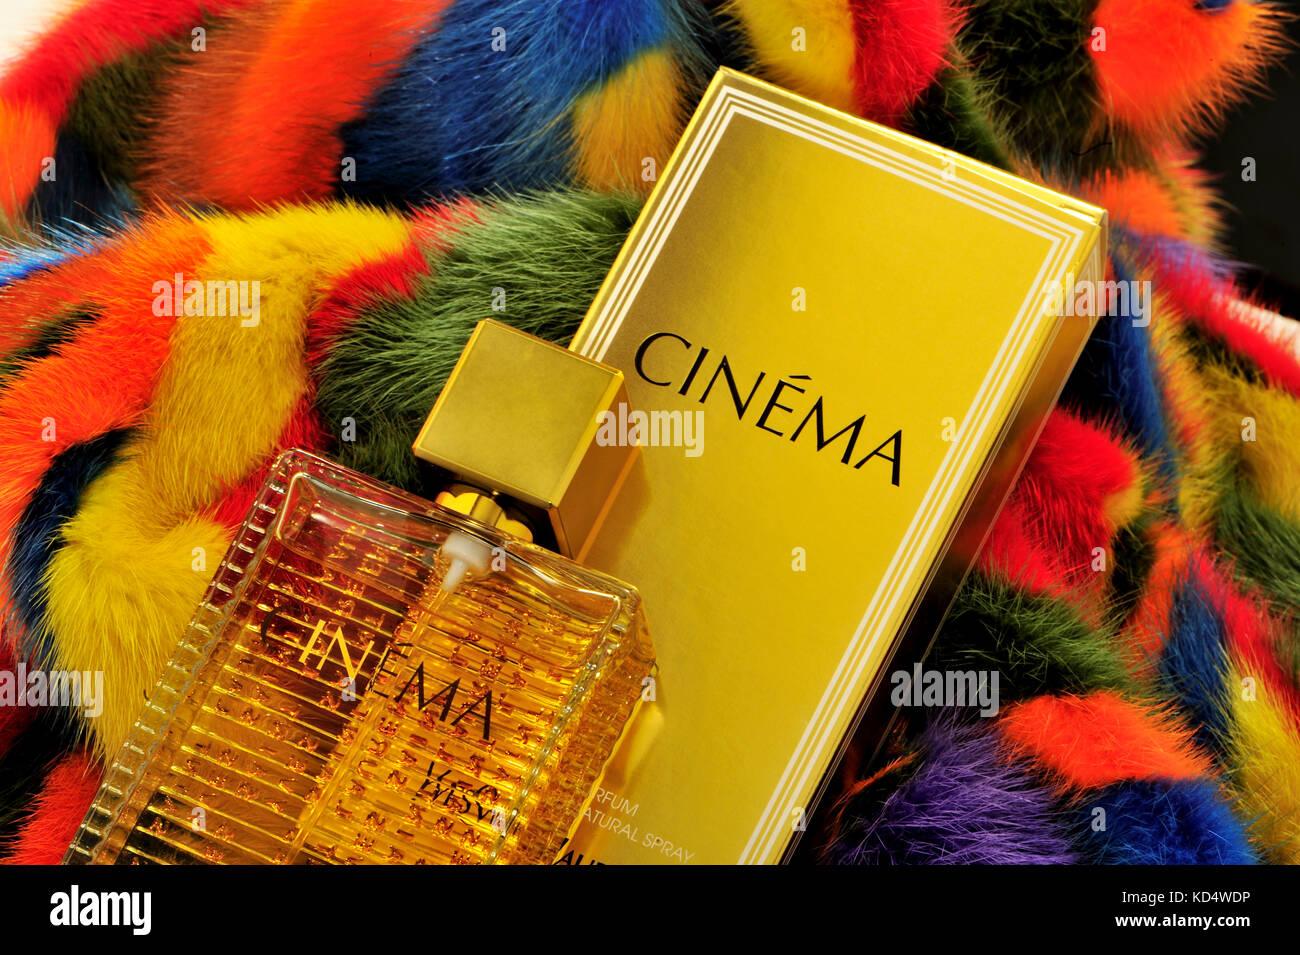 Yves Saint Laurent Lifestyle Perfum Odour Cinema Gift Yves